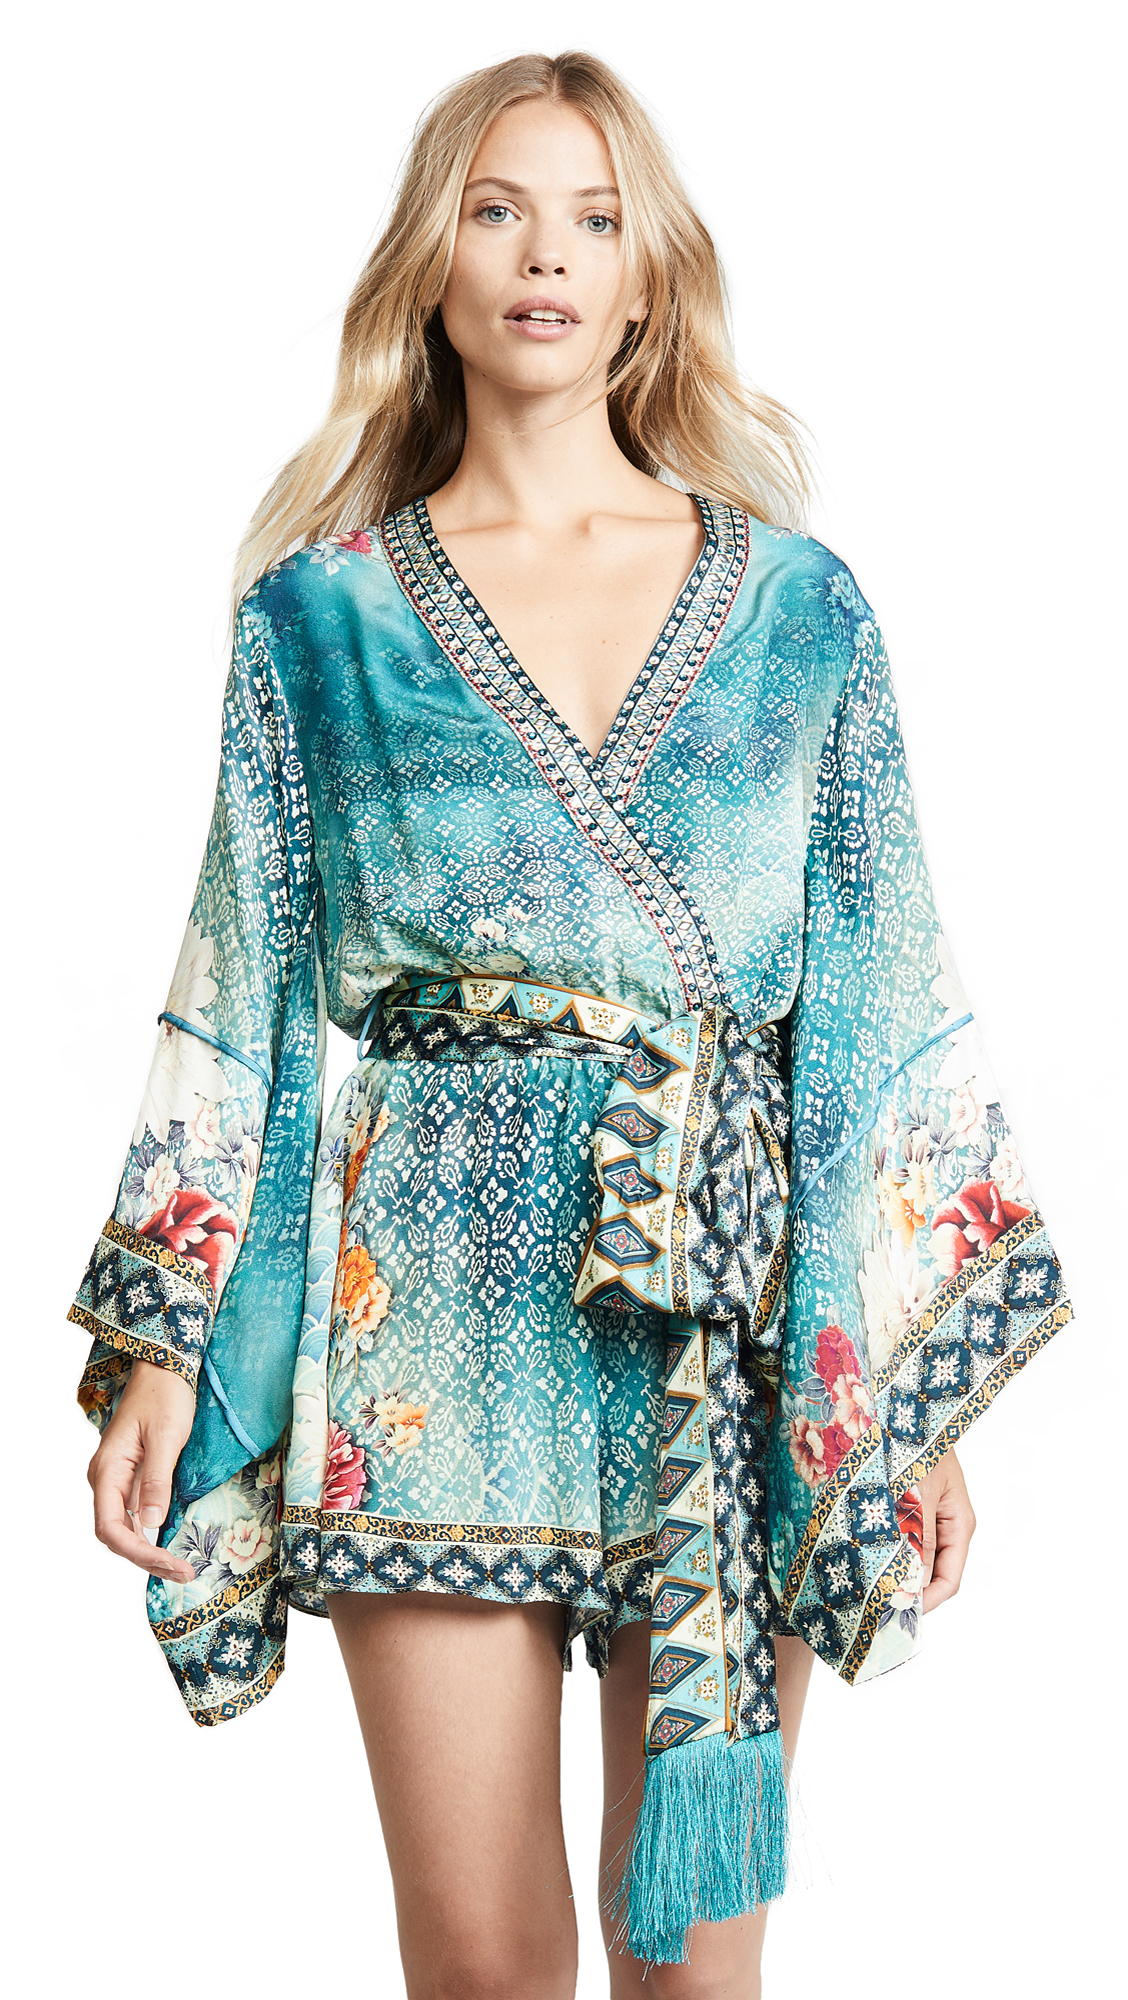 Camilla Kimono Sleeve Playsuit with Obi Belt - Heirloom